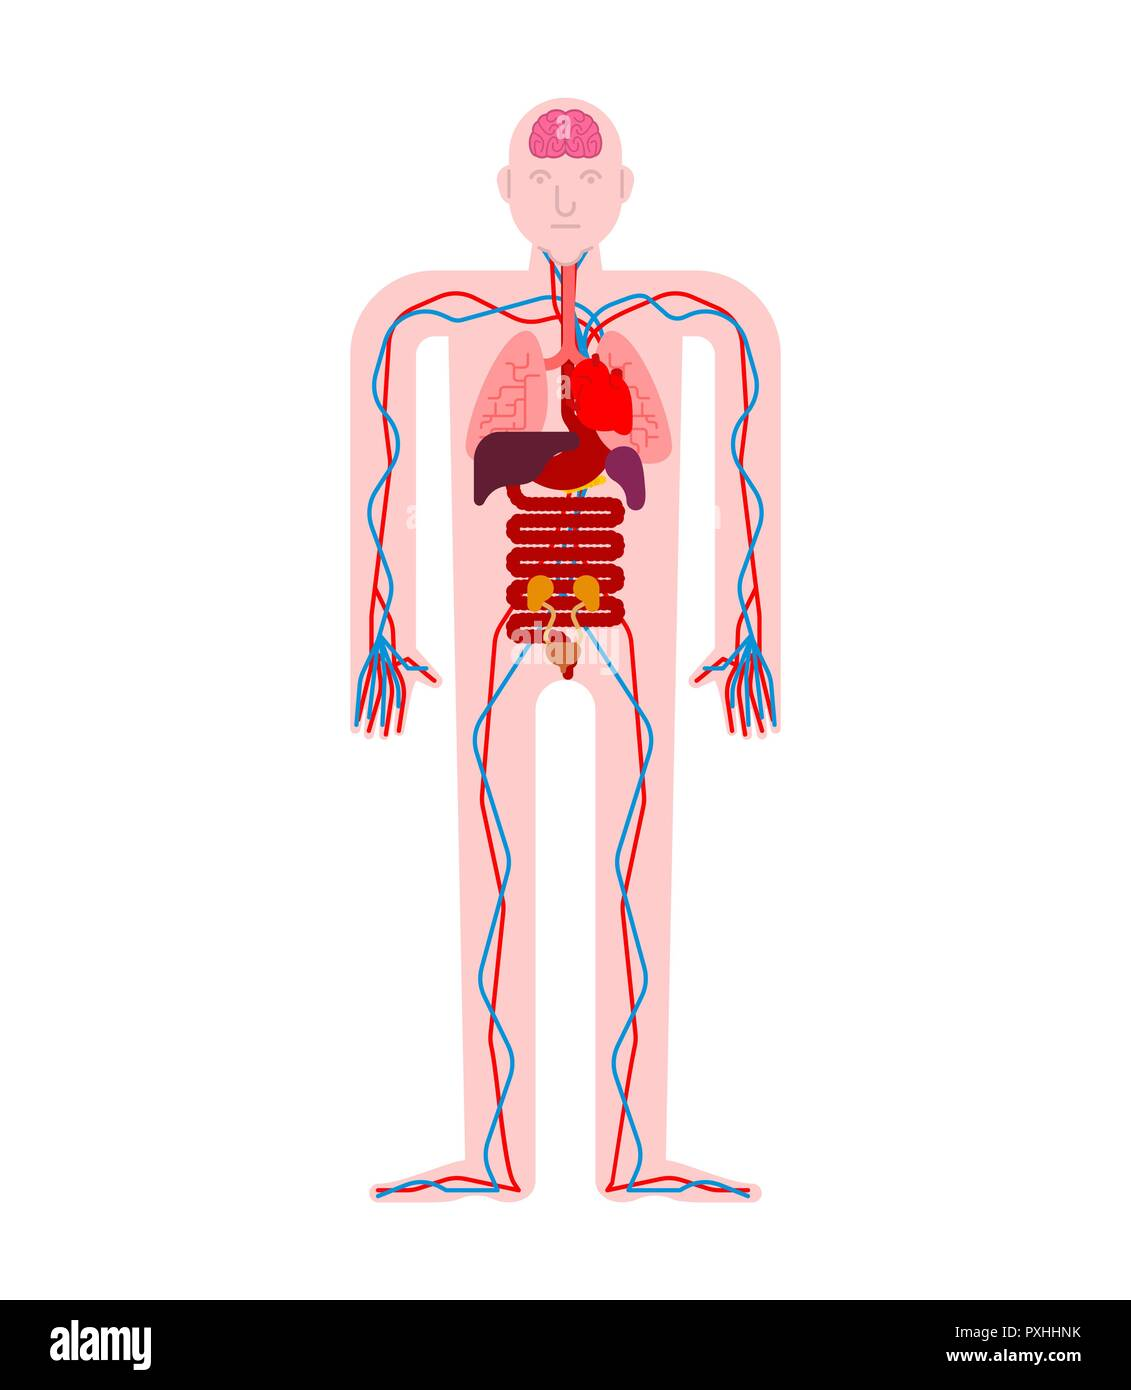 Human Anatomy Organs Internal Systems Of Man Body And Organs